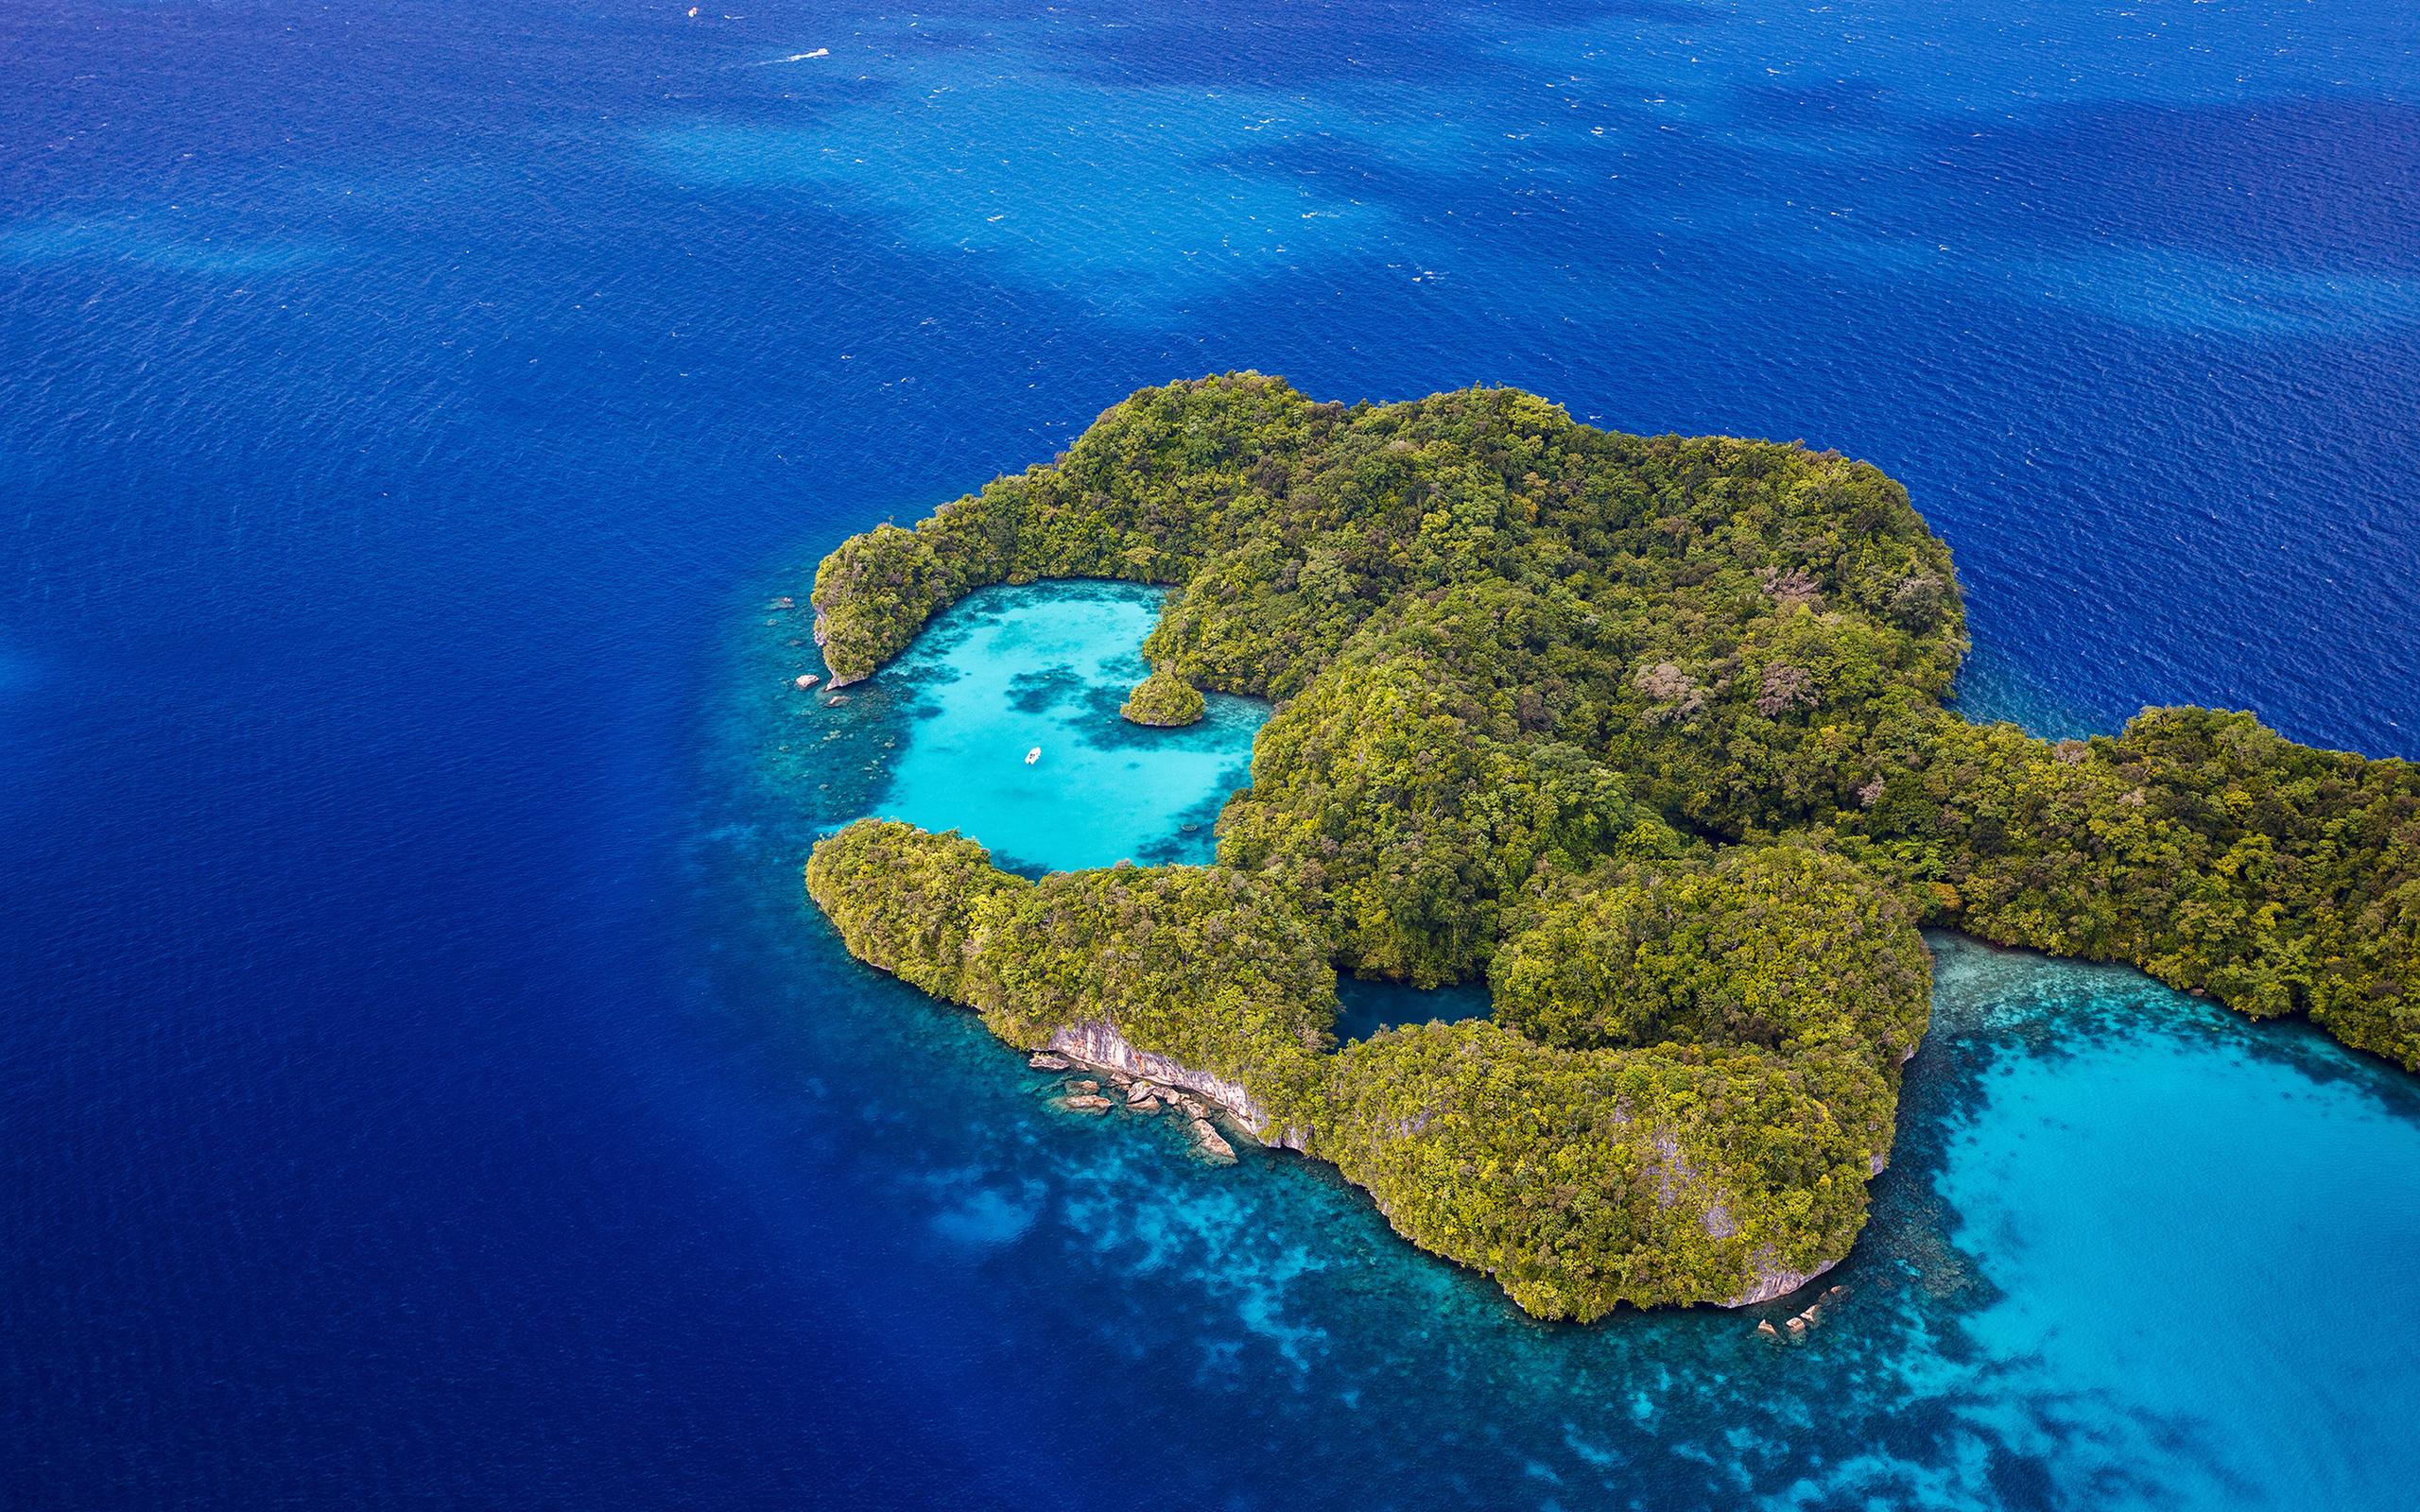 тропики, море, остров, природа, лагуна